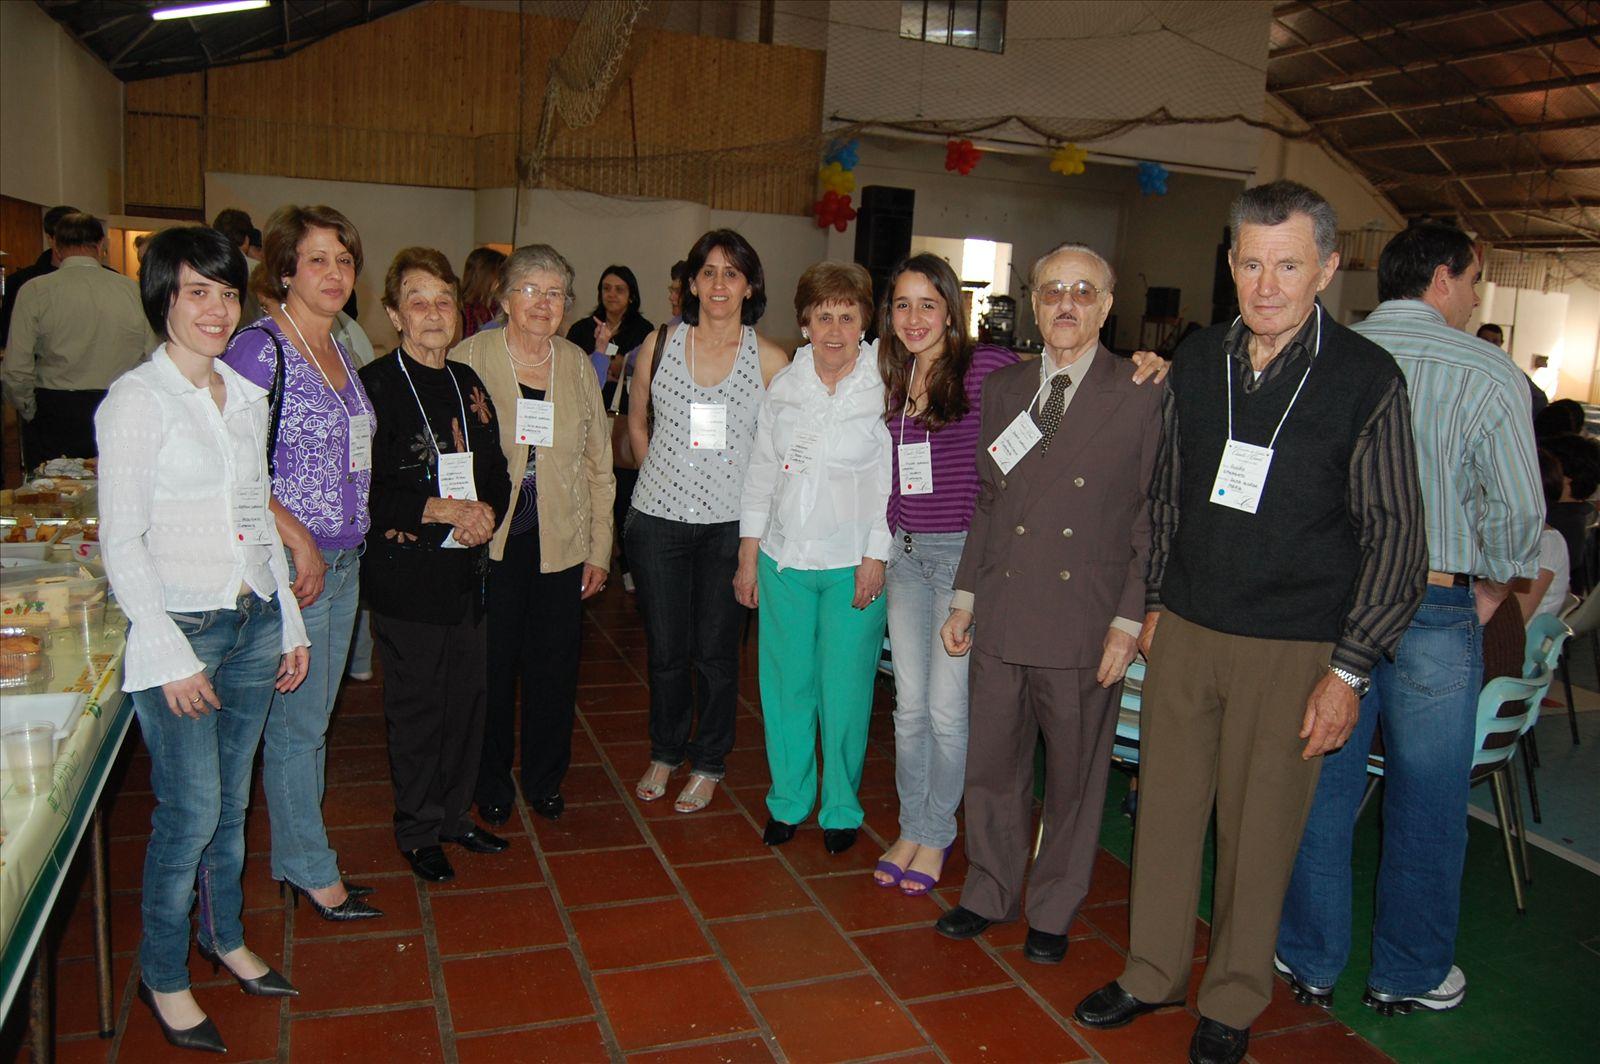 2º Encontro Família Cornelli - 11.10.2009 (45)_0